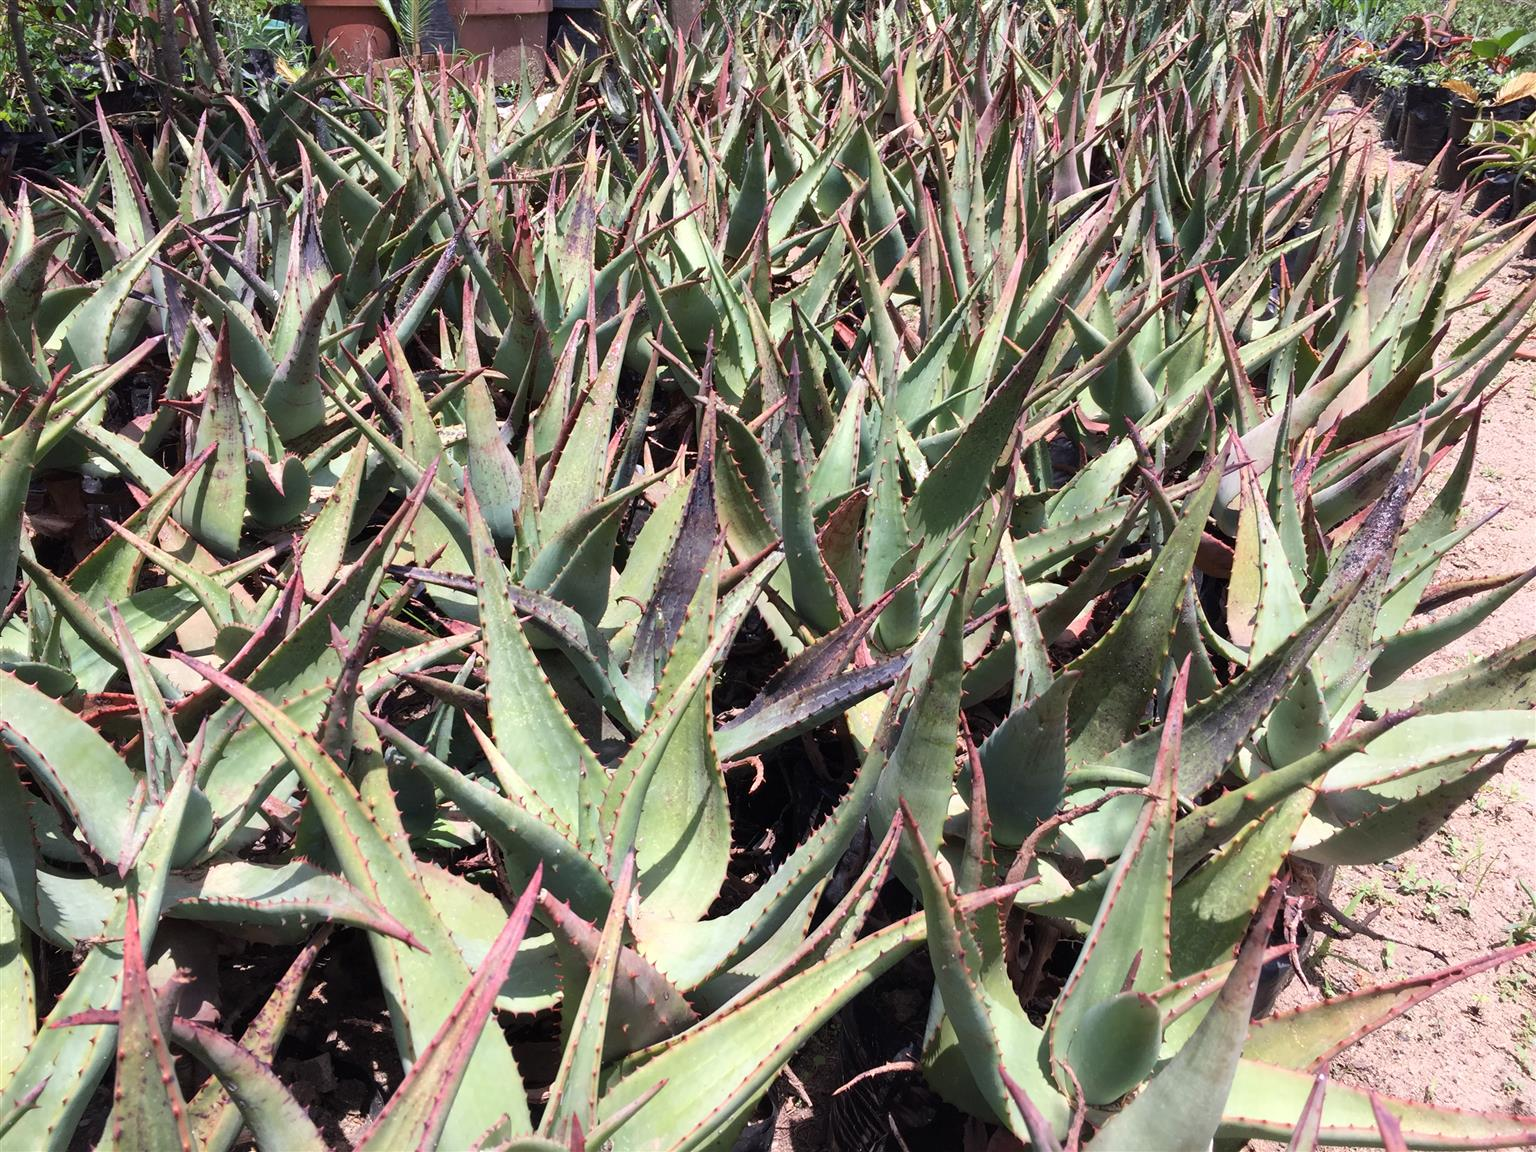 INDIGENOUS Aloes. Ferox. Marlottii. Vanbaelenii. Striata